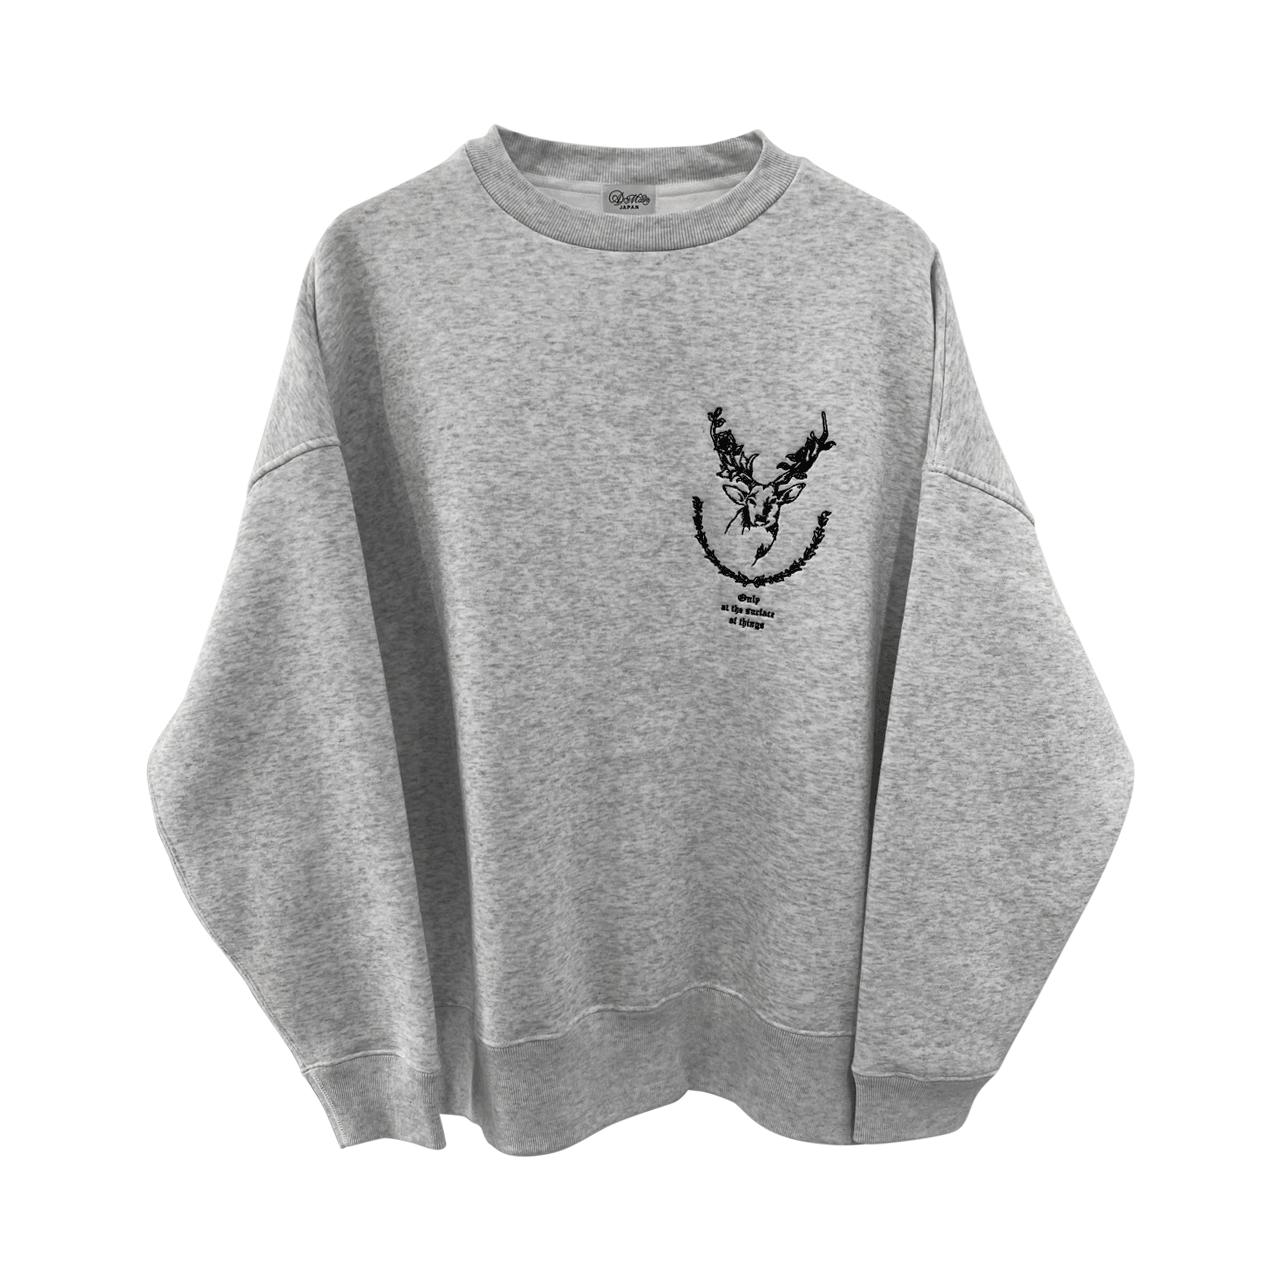 9___89 Deer embroidery sweat Ash x Black